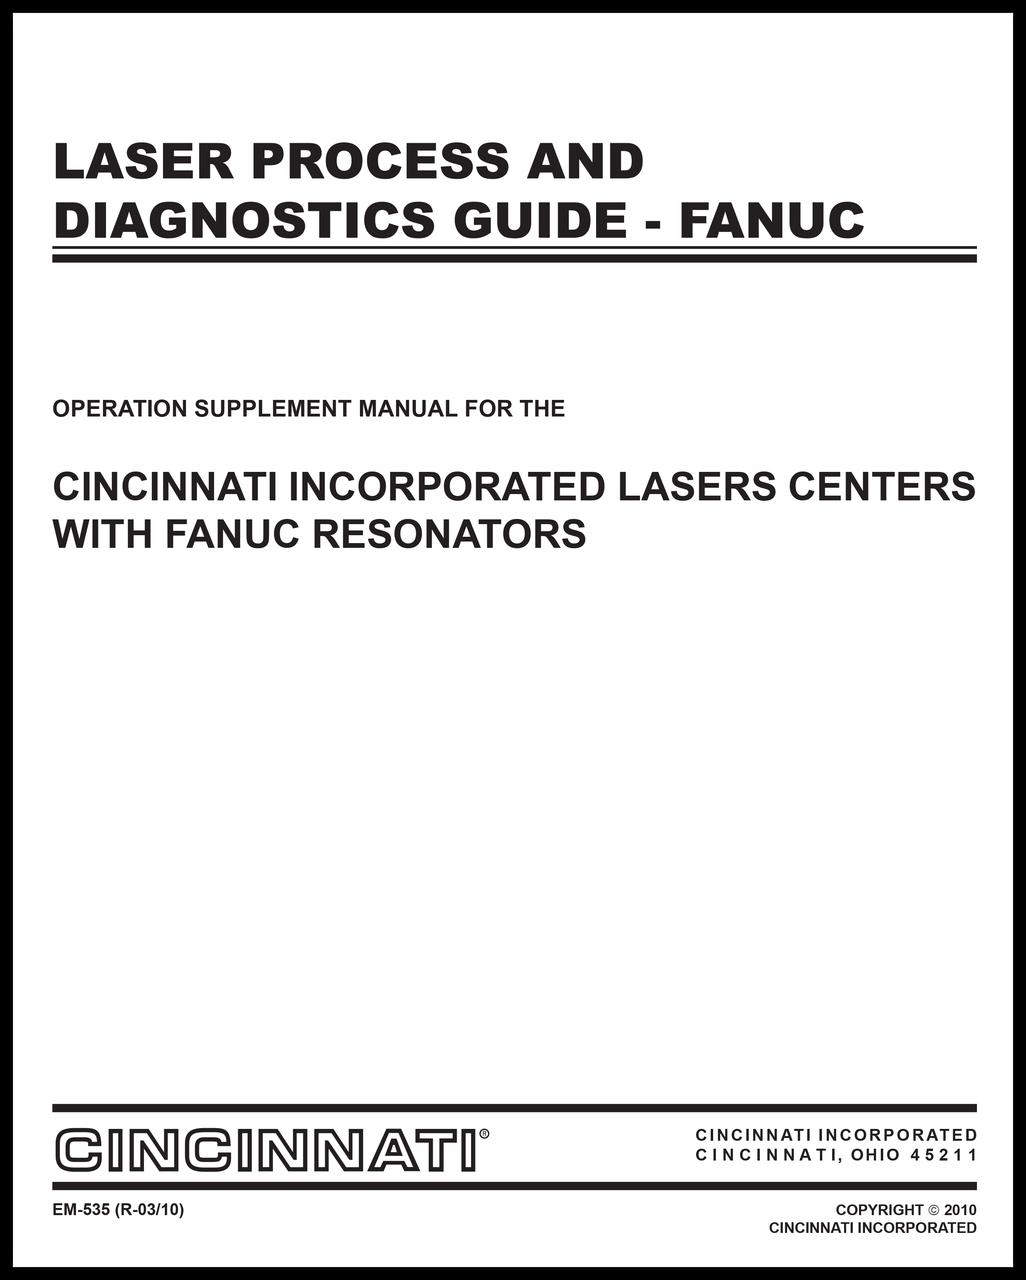 EM-535_(R-03-10) Laser Process and Diagn Guide-Fanuc